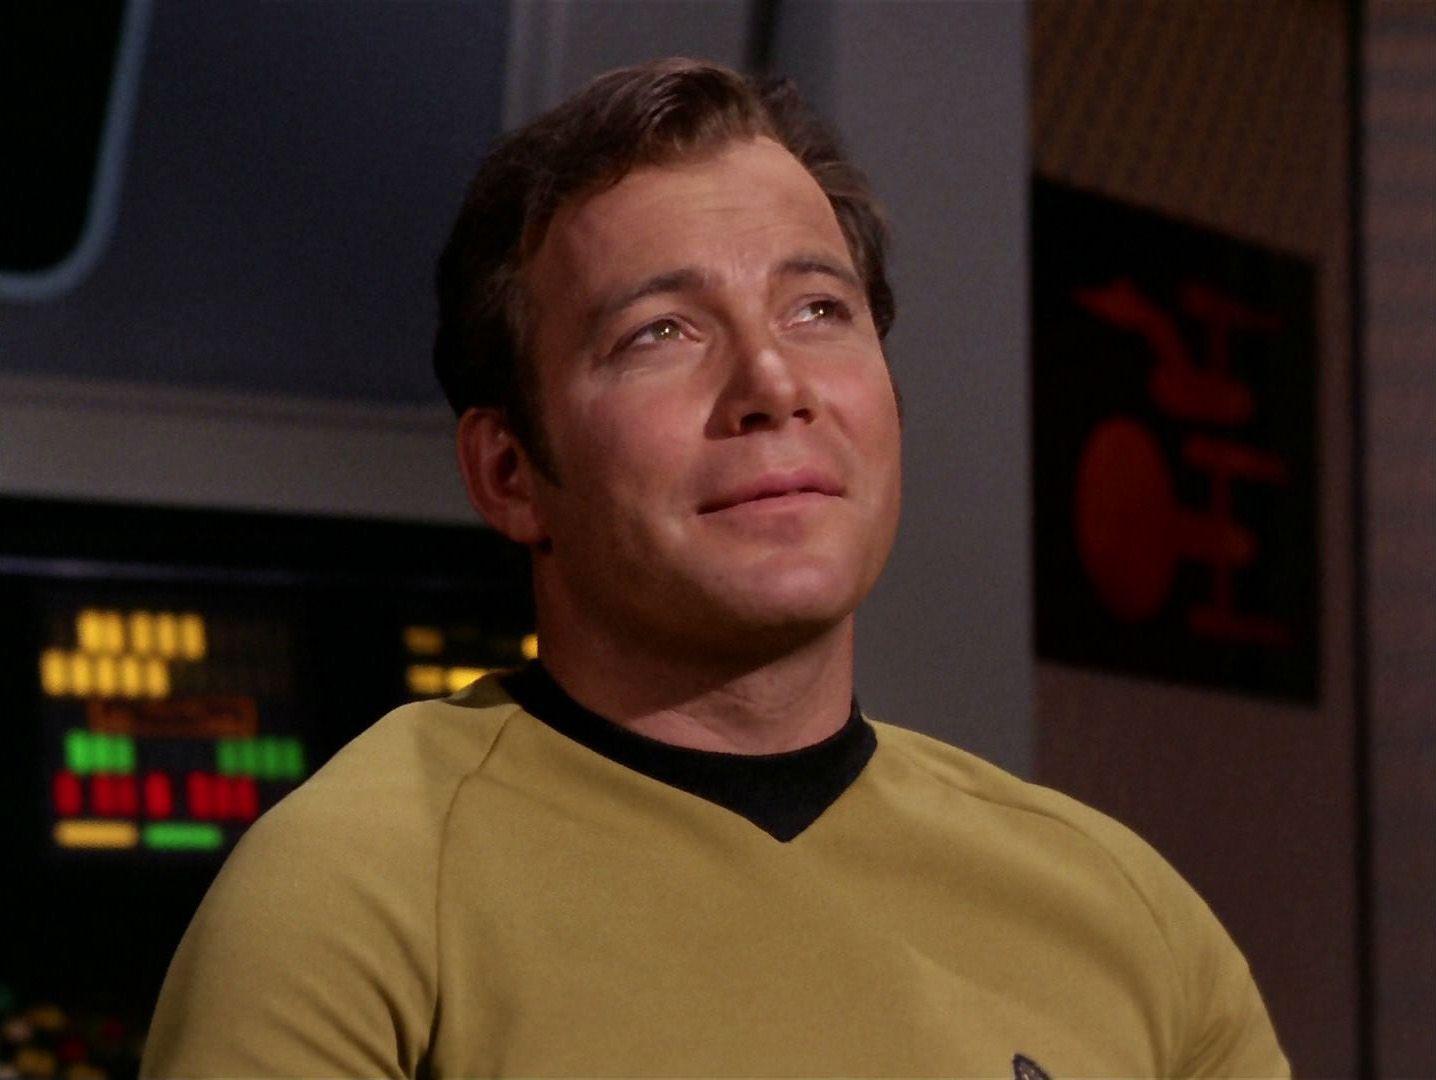 George takei thinks gay character in star trek is a bridge too far